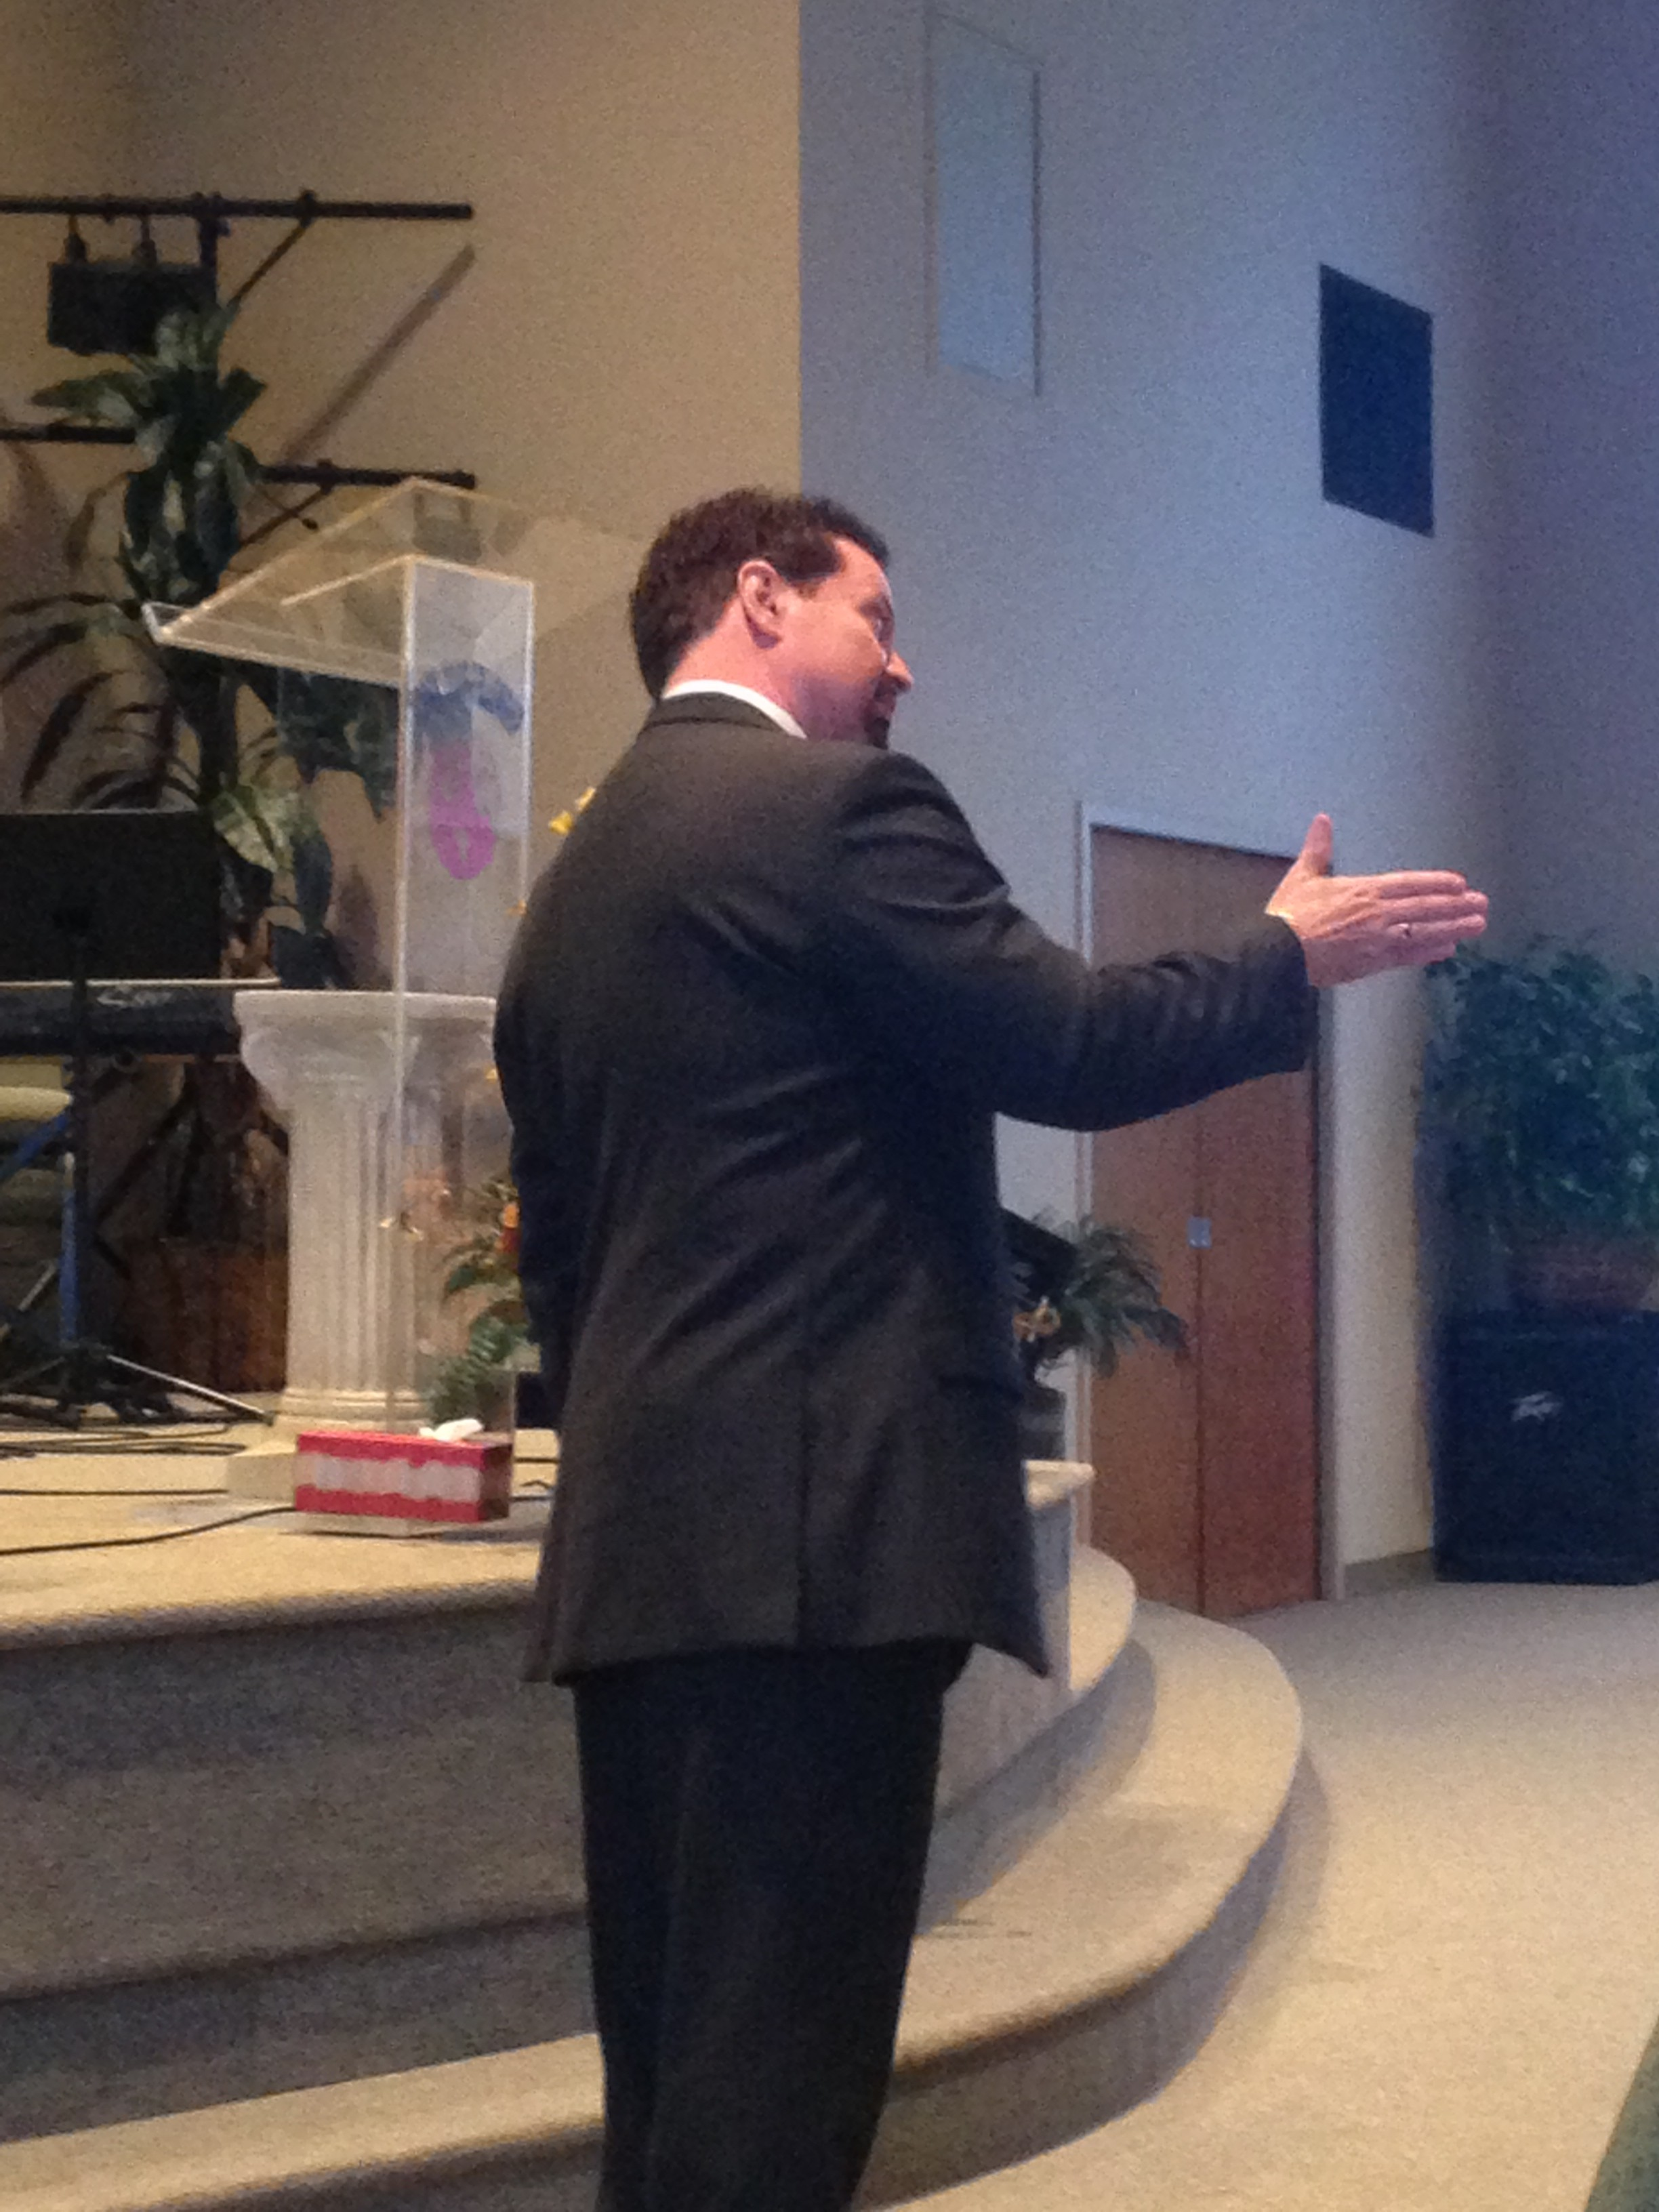 Pastor John Cahill sharing the Word of God